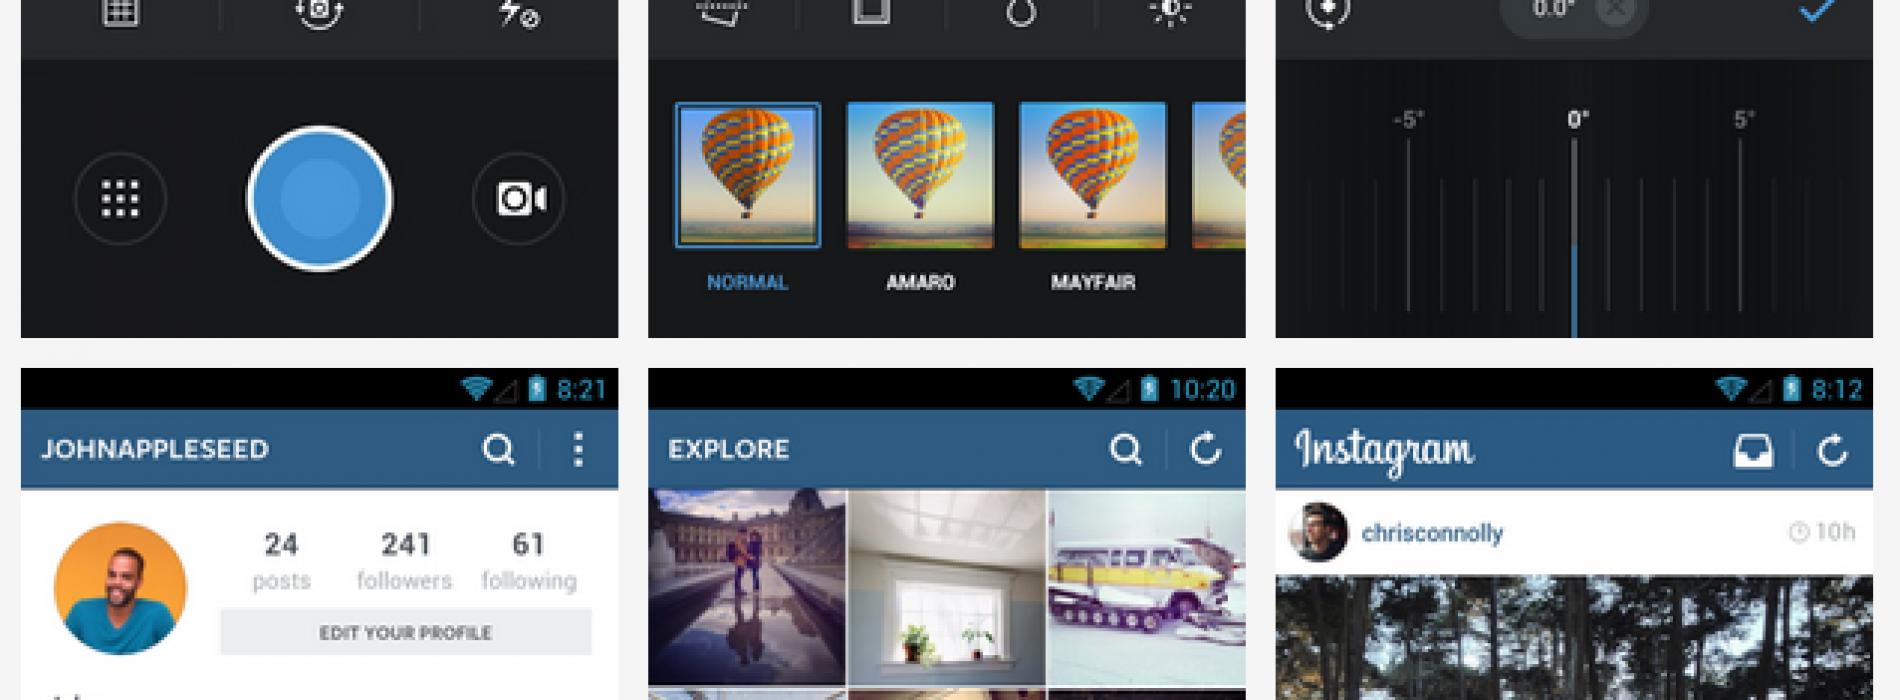 Instagram 5.1 debuts as faster, more responsive app